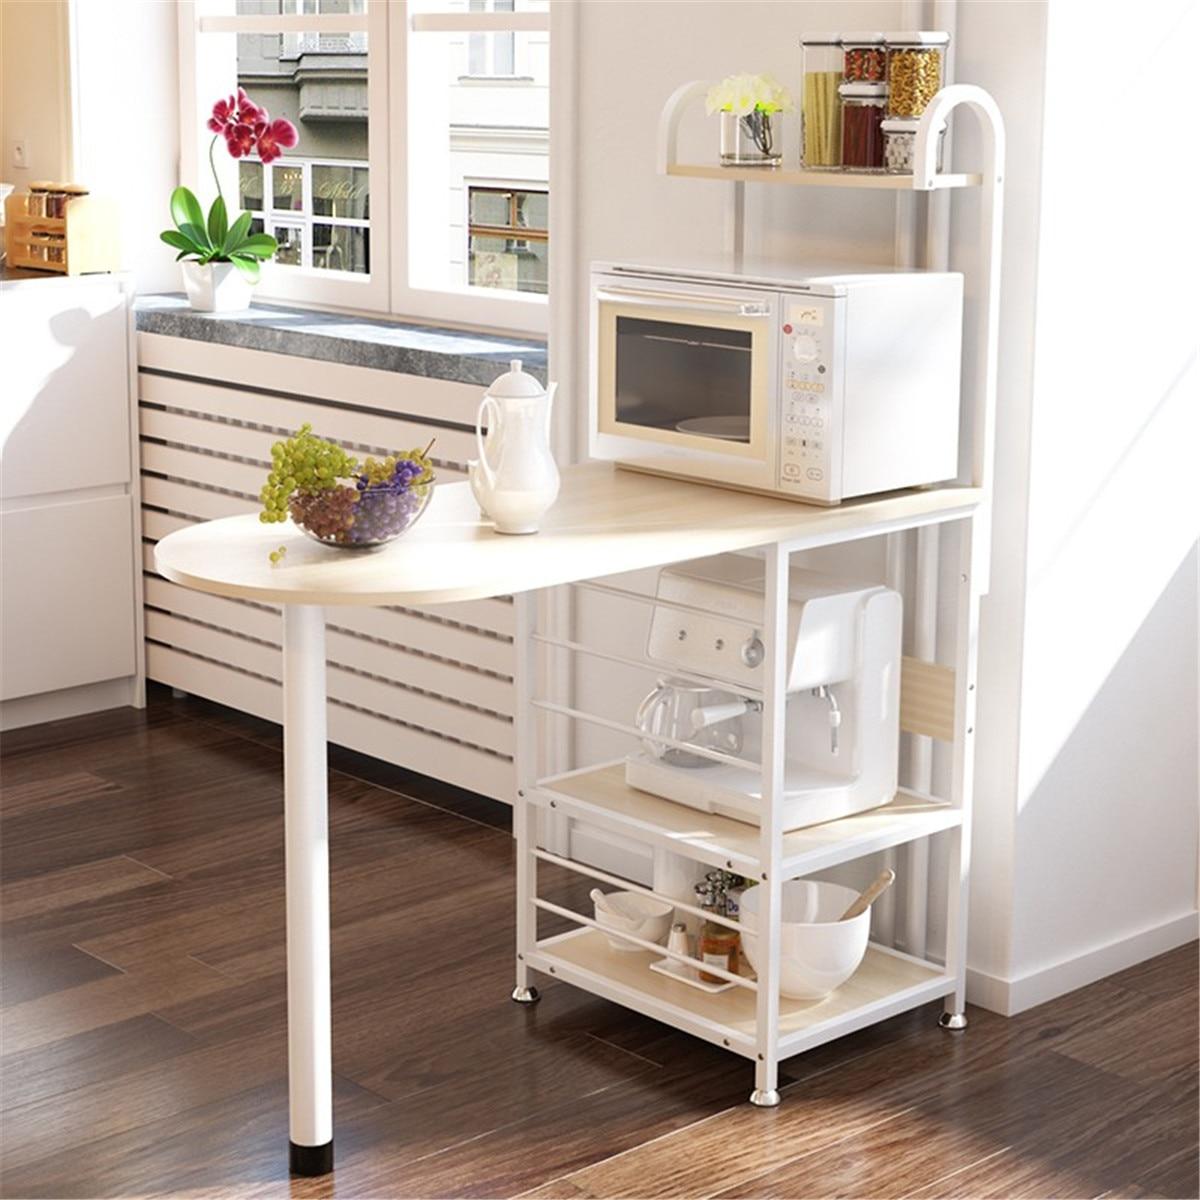 Kitchen Multi Layers Wooden Bar Table Organizer Cocktail Microwave Storage Rack Shelf Stand 110x50x127cm Home Bar Furniture Aliexpress